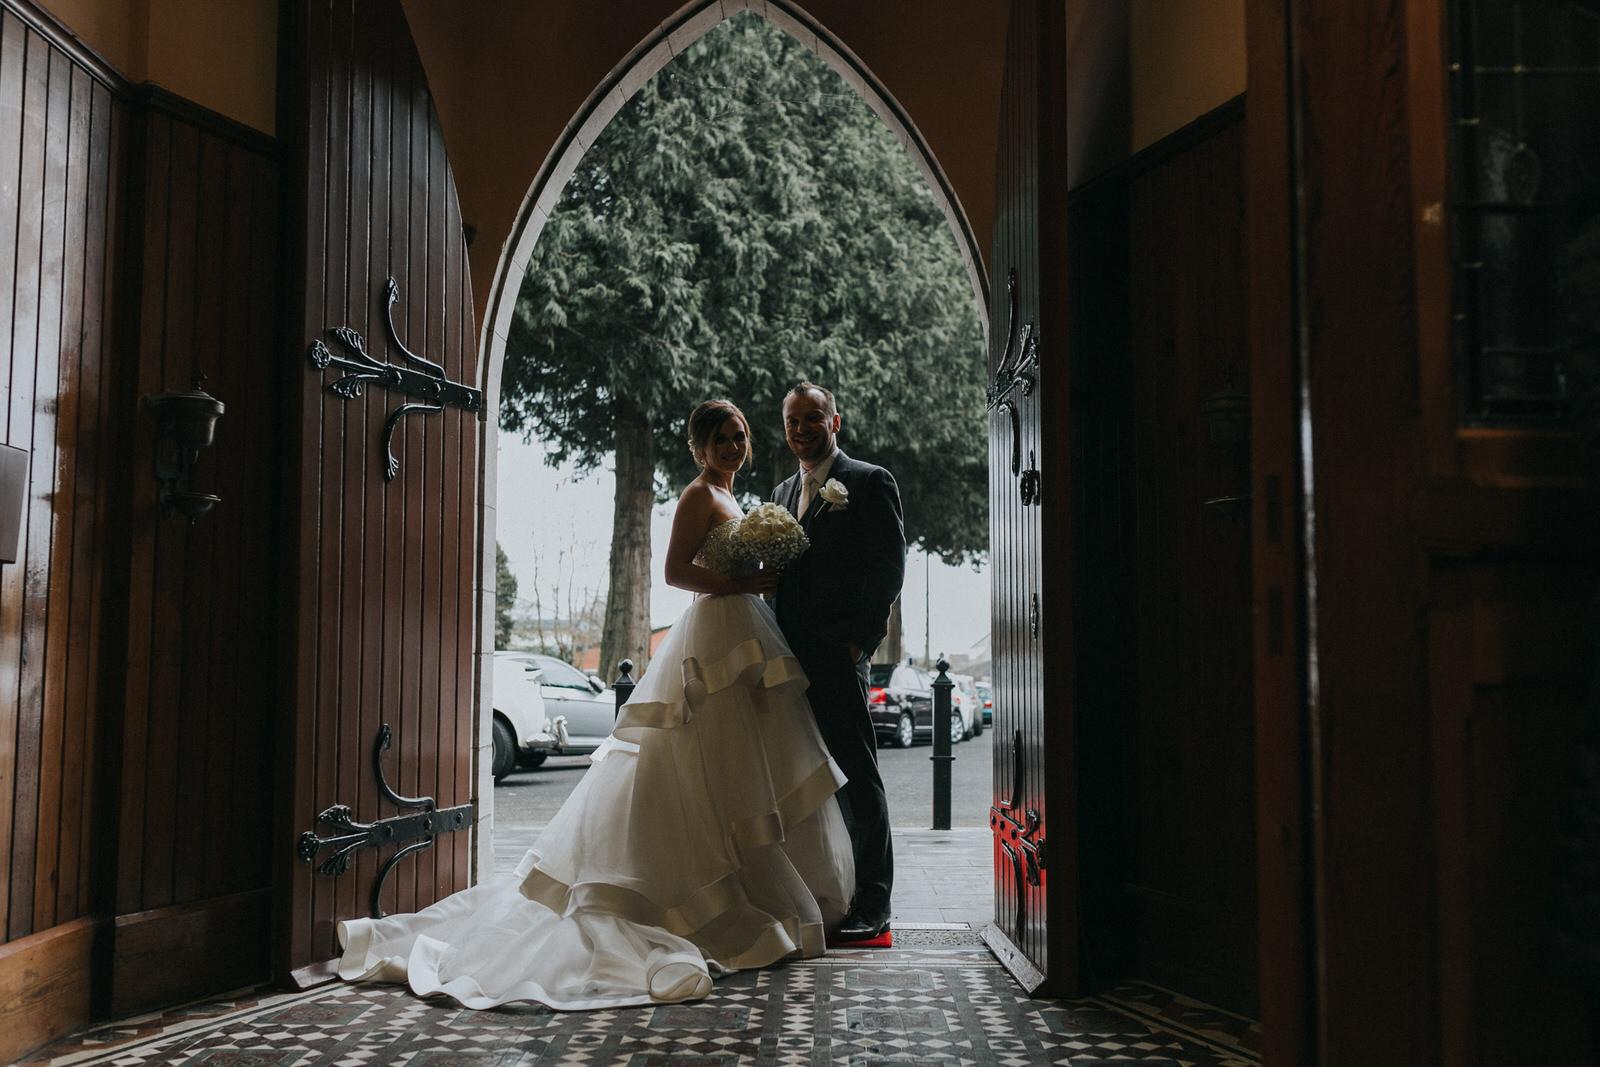 Clonabreany_wedding-photographer_roger_kenny_ireland_054.jpg